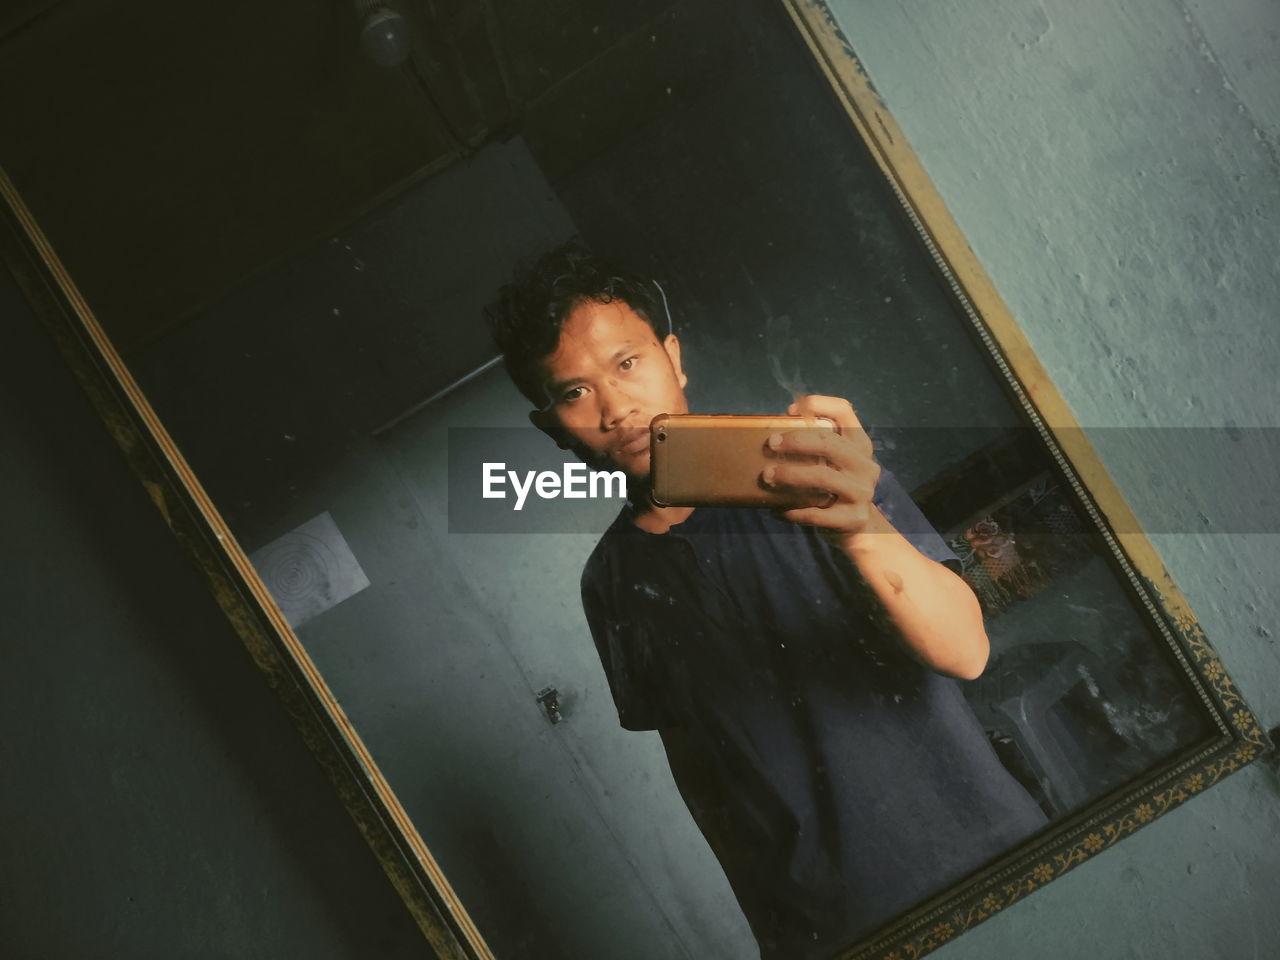 Portrait of man taking selfie in front of mirror